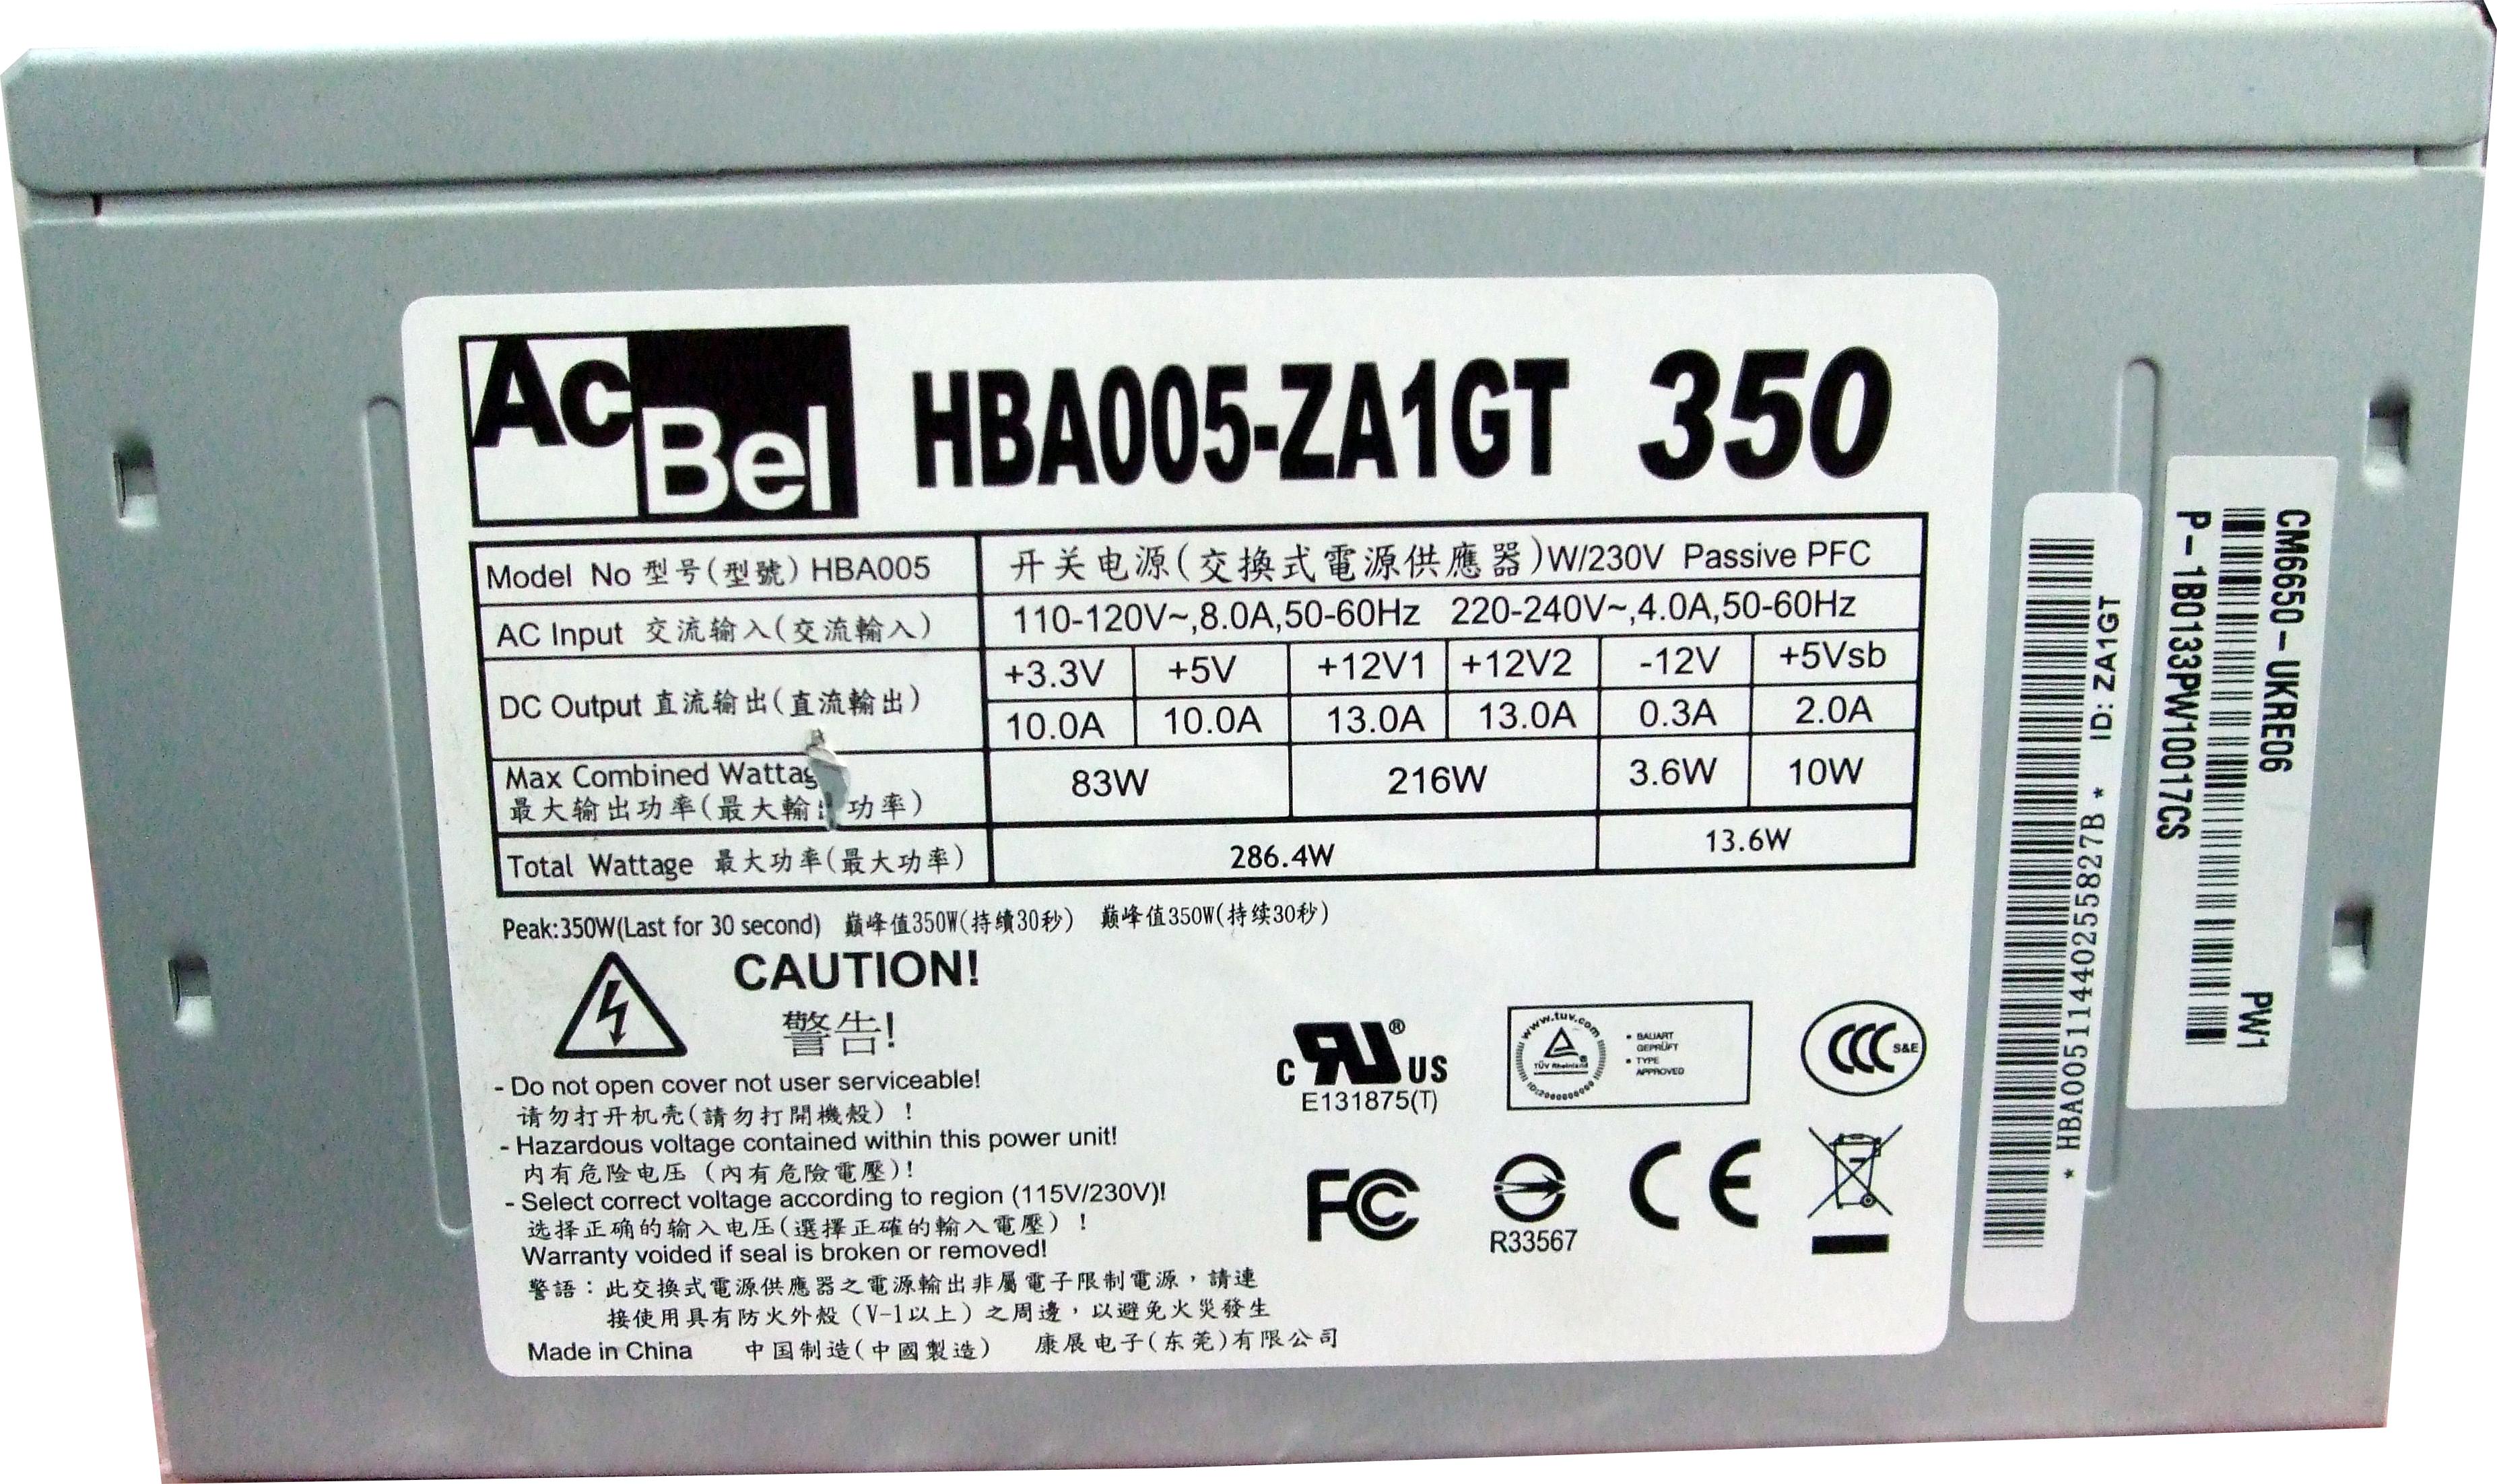 HBA005-ZA1GT AcBel 350W 24 Pin ATX PSU Model HBA005 | Power Supplies ...